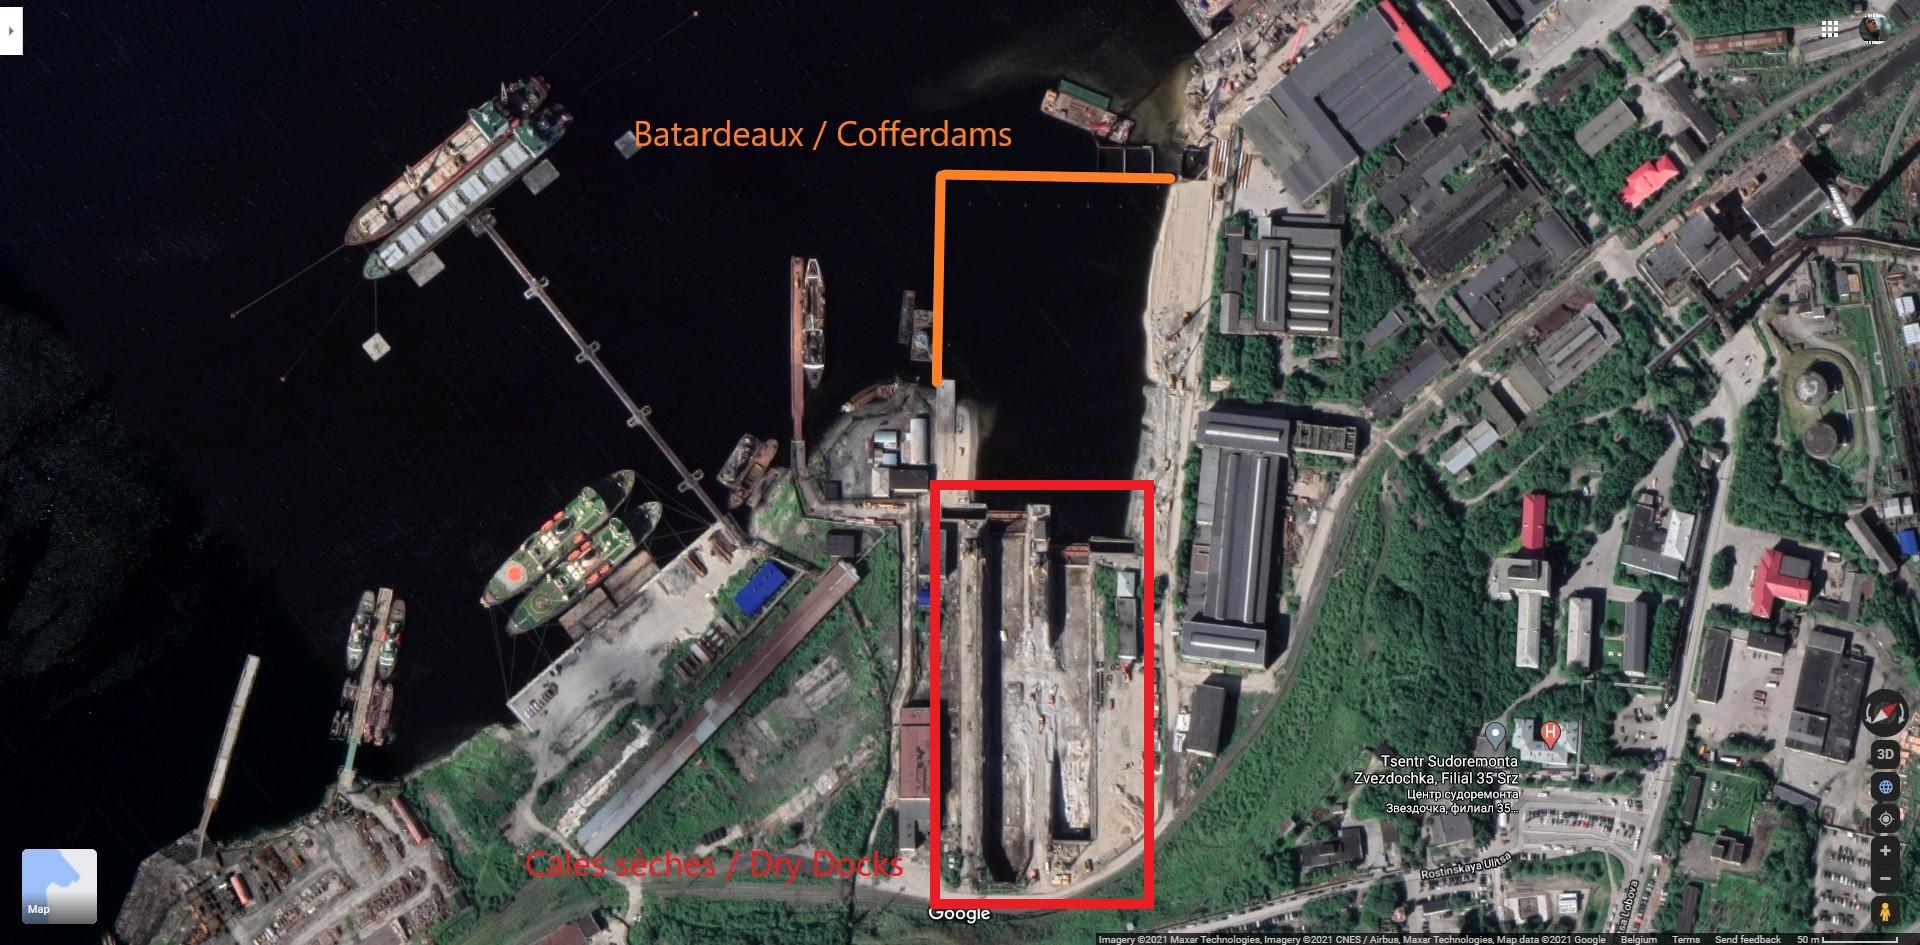 Aircraft Carrier Admiral Kuznetsov: News #2 - Page 34 EwJ7JUoXYAEwqL6?format=jpg&name=large